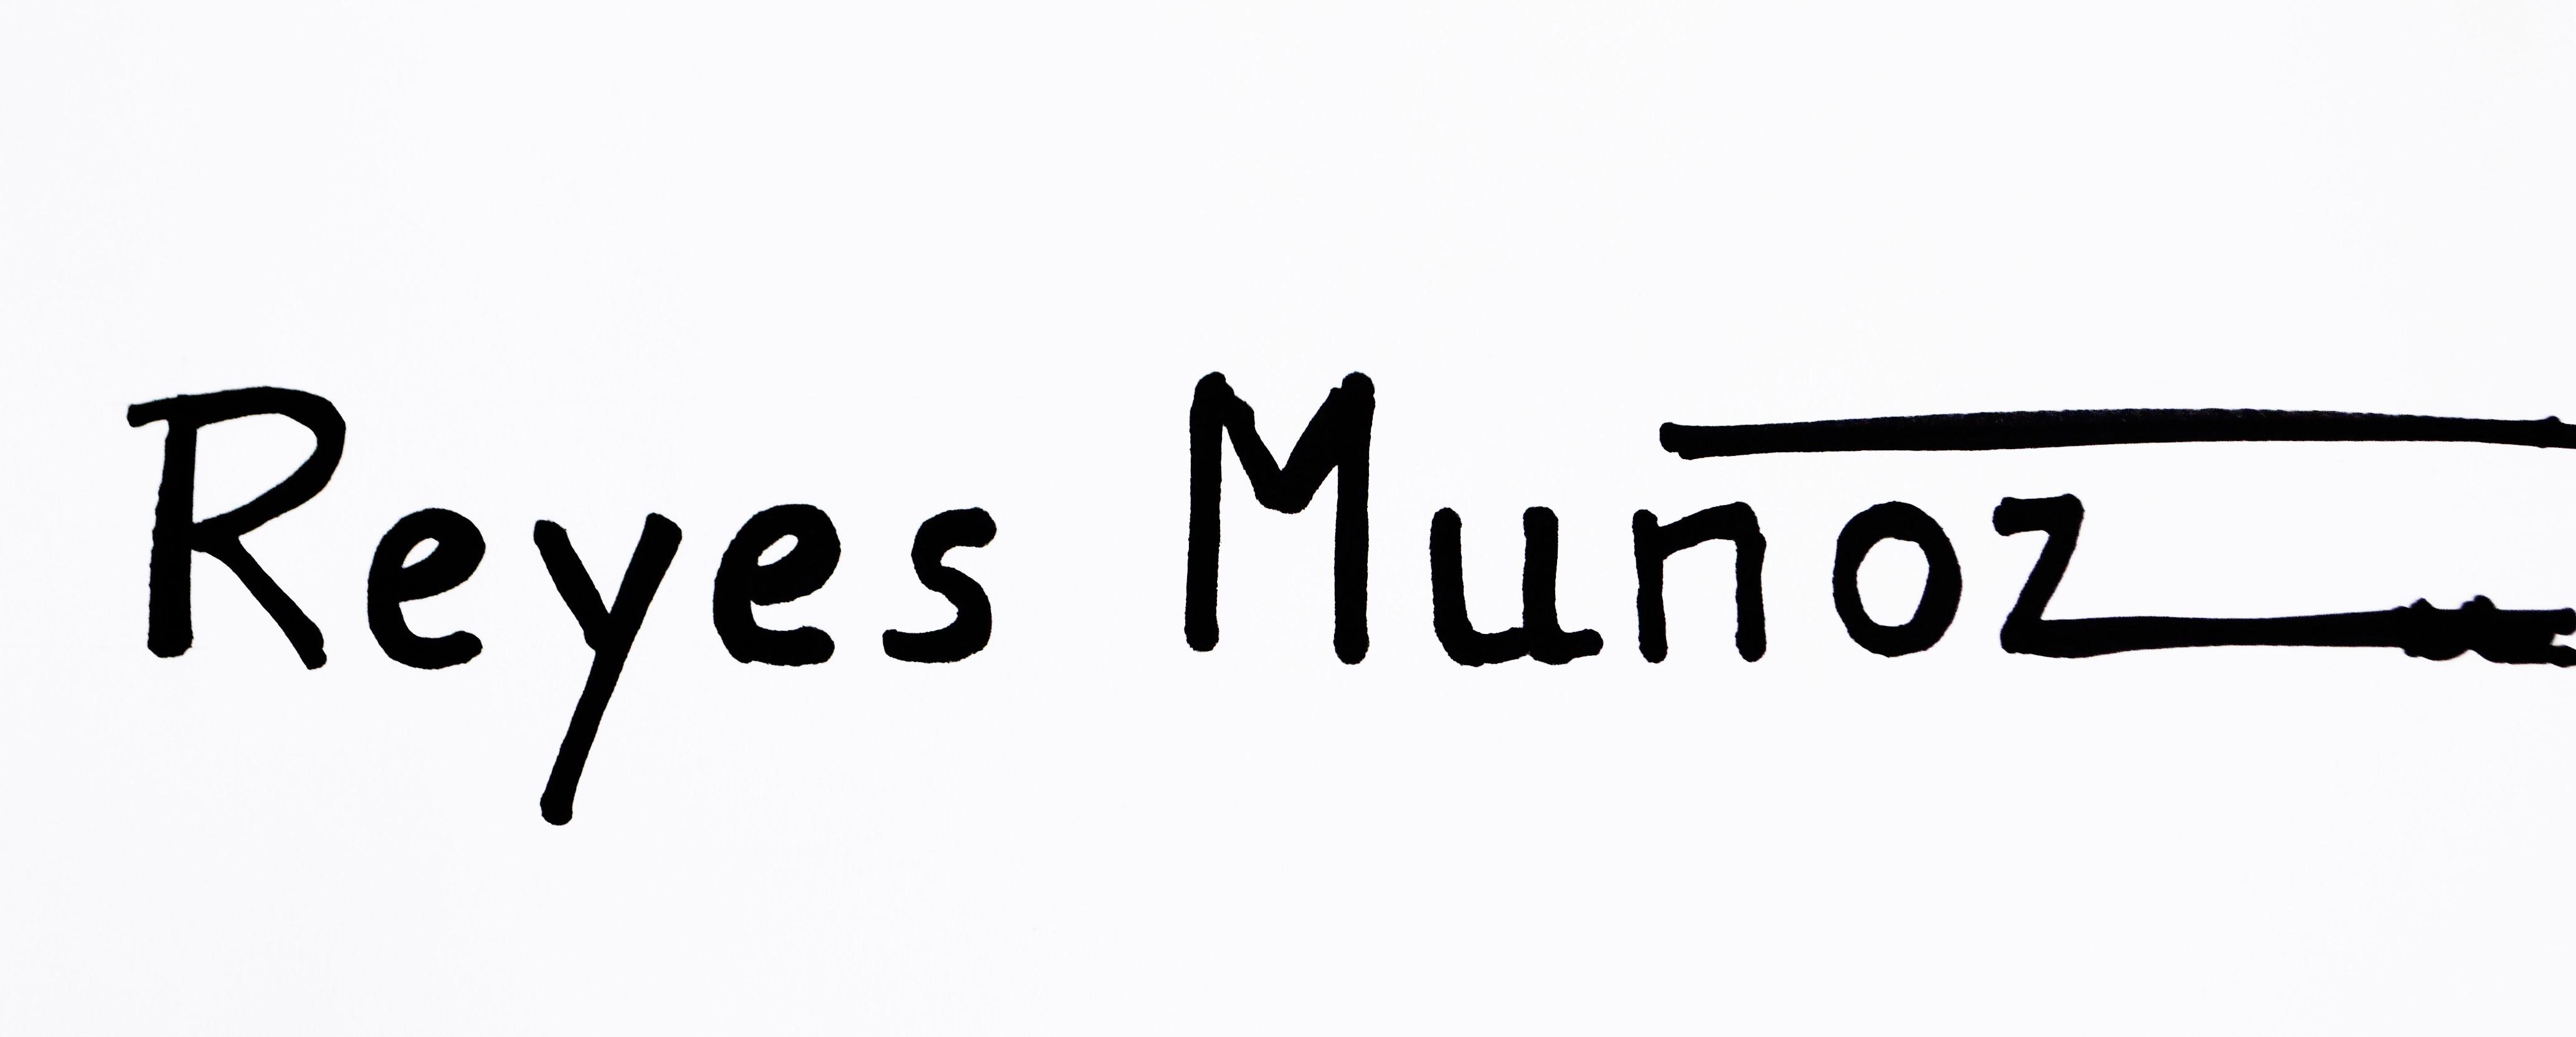 REYES MUÑOZ Signature